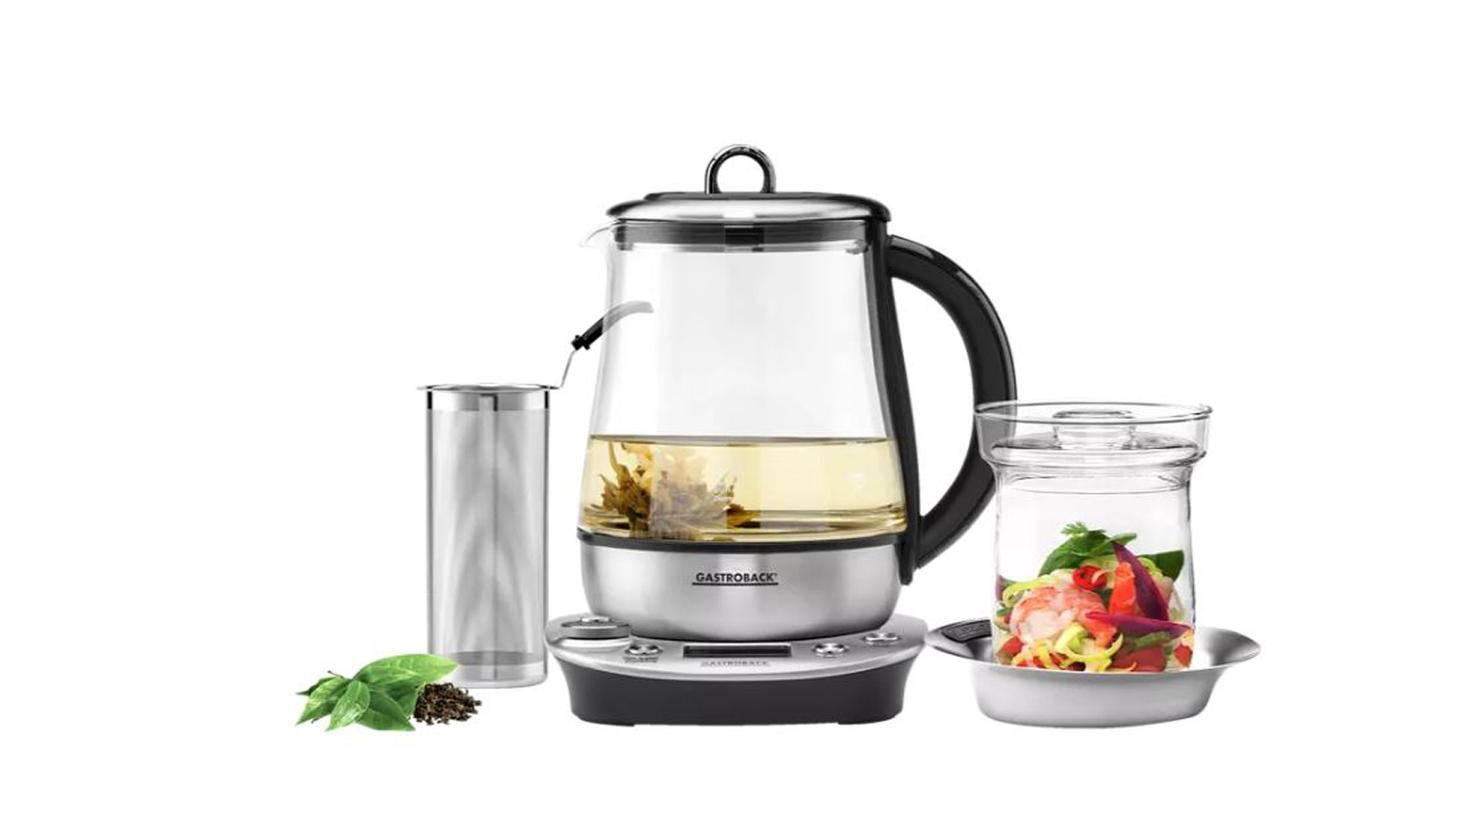 Gastroback 42438 Design Tea & More Machine à thé avancée